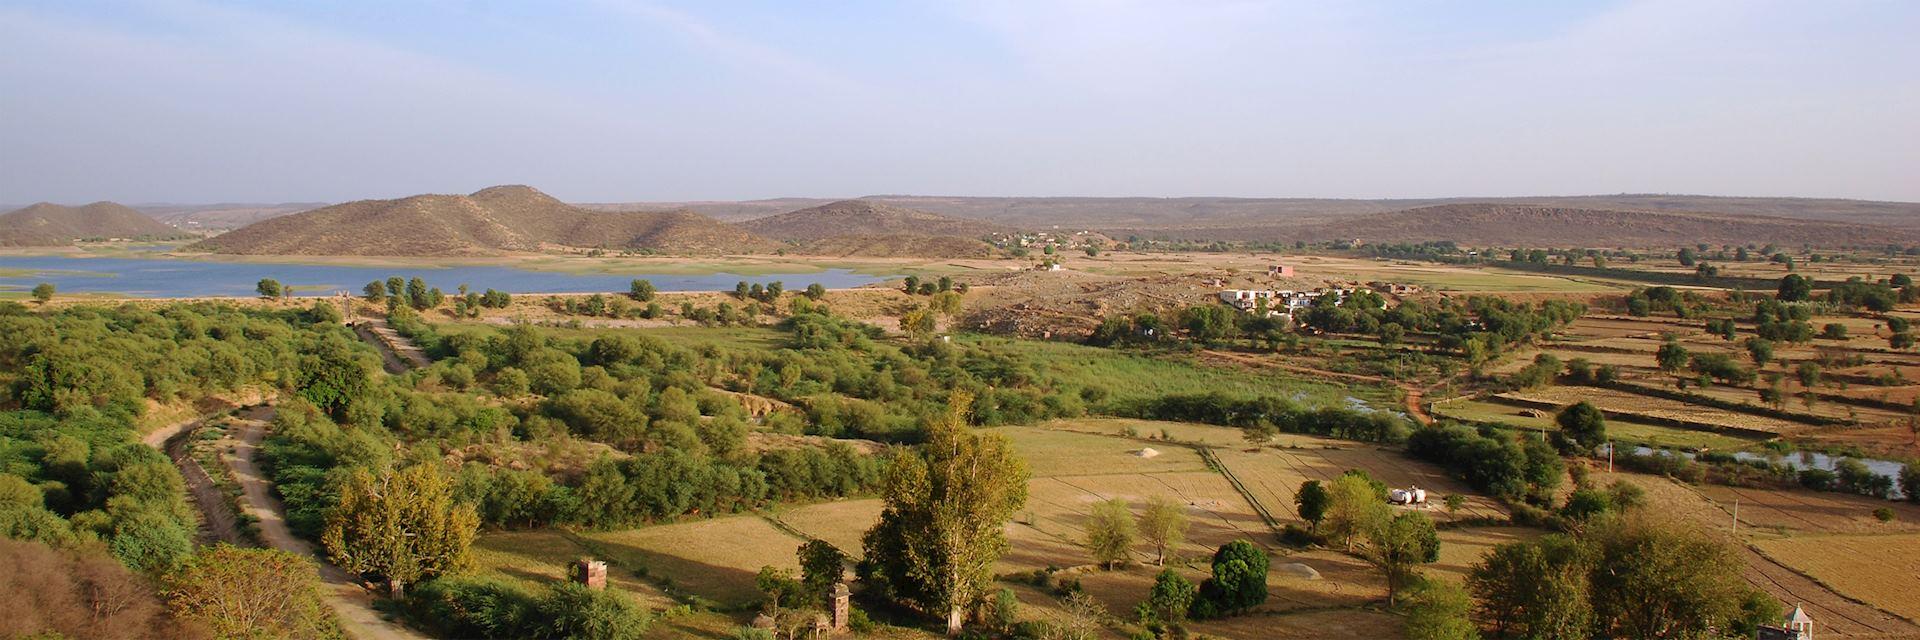 Ramathra countryside